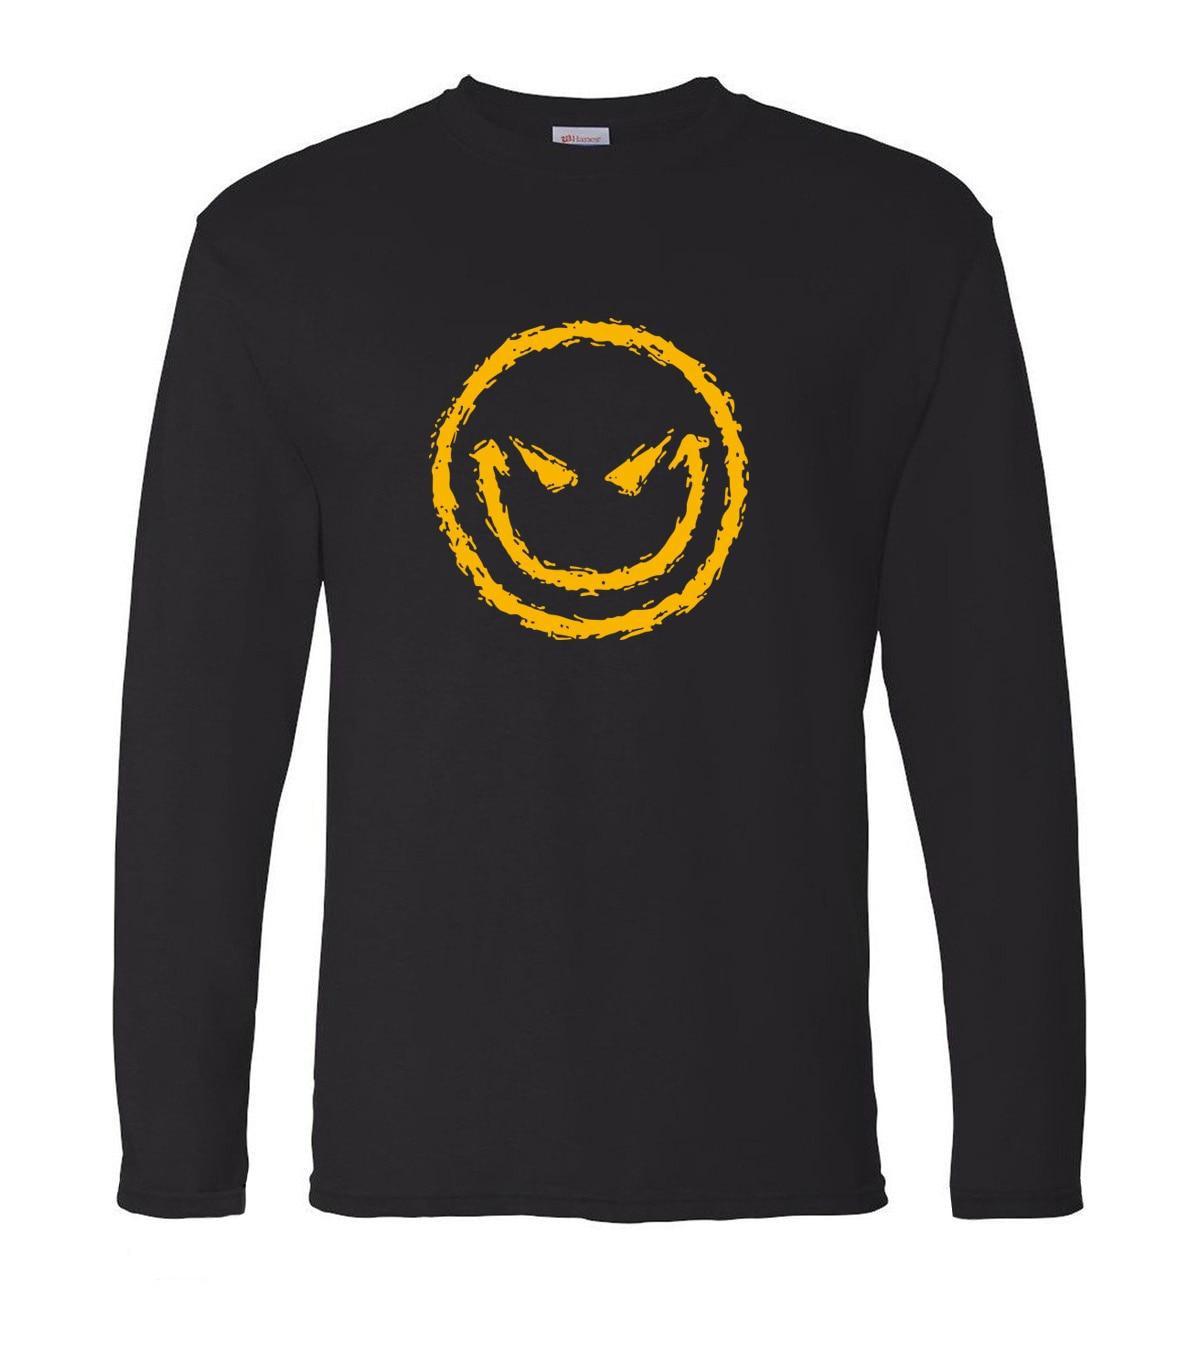 Evil Smiley Face hip hop style streetwear 2019 new spring 100% cotton men's long sleeve o-neck T-shirts brand man t shirt S-2XL